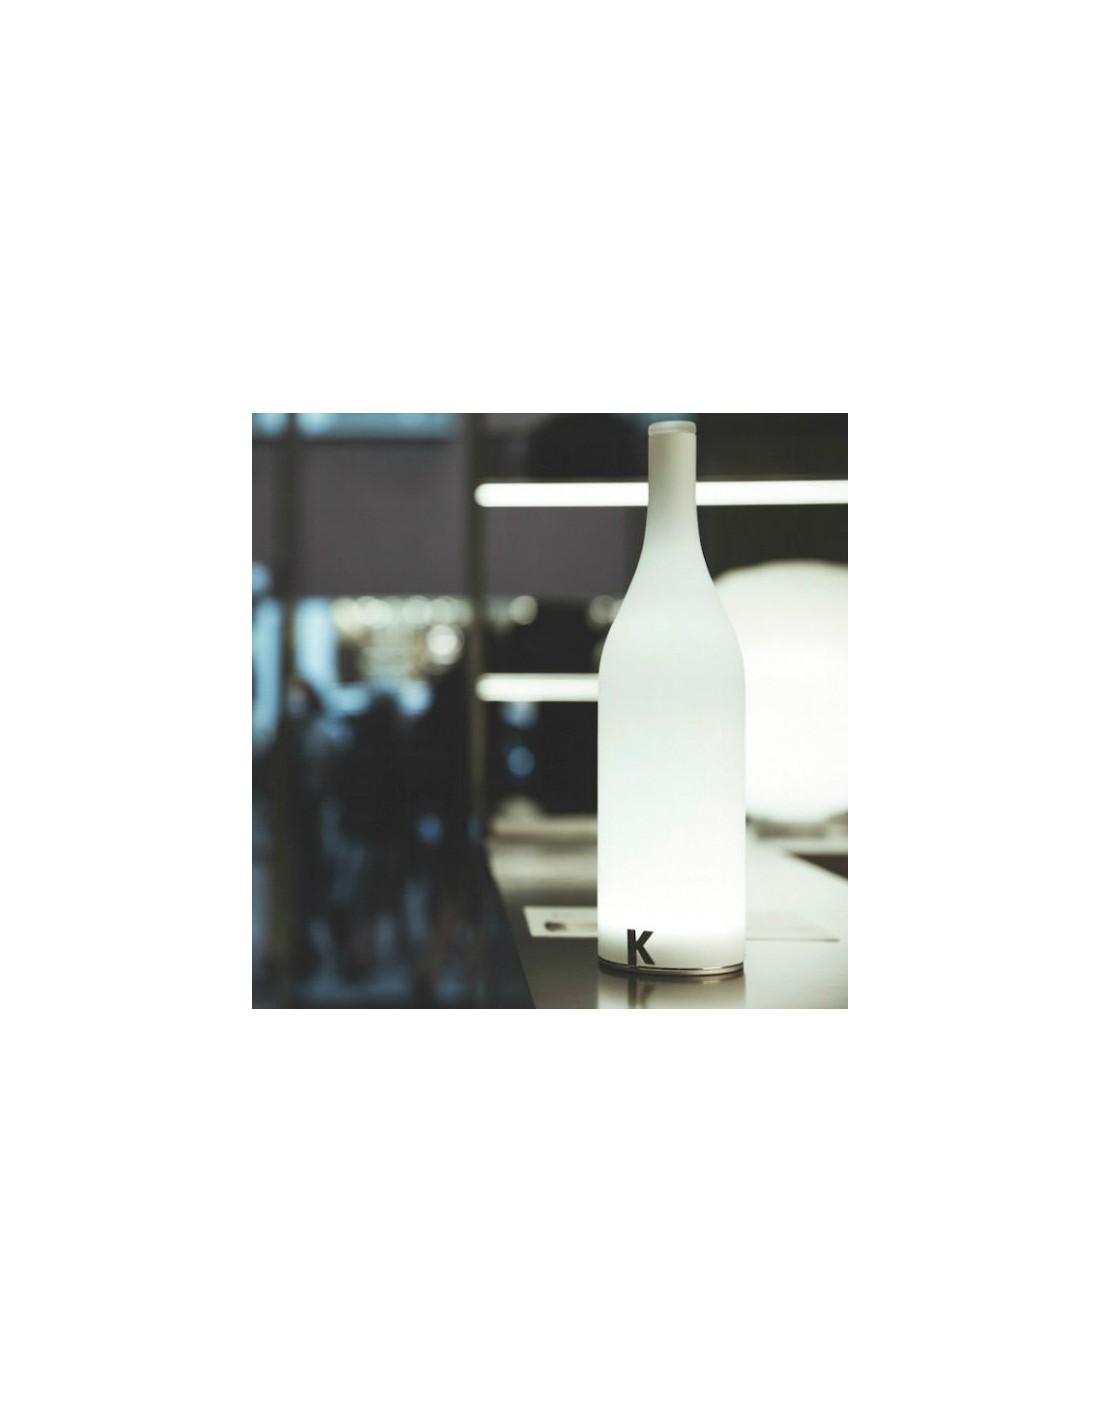 lampe poser sans fil bacco vue d 39 ensemble ambiance. Black Bedroom Furniture Sets. Home Design Ideas